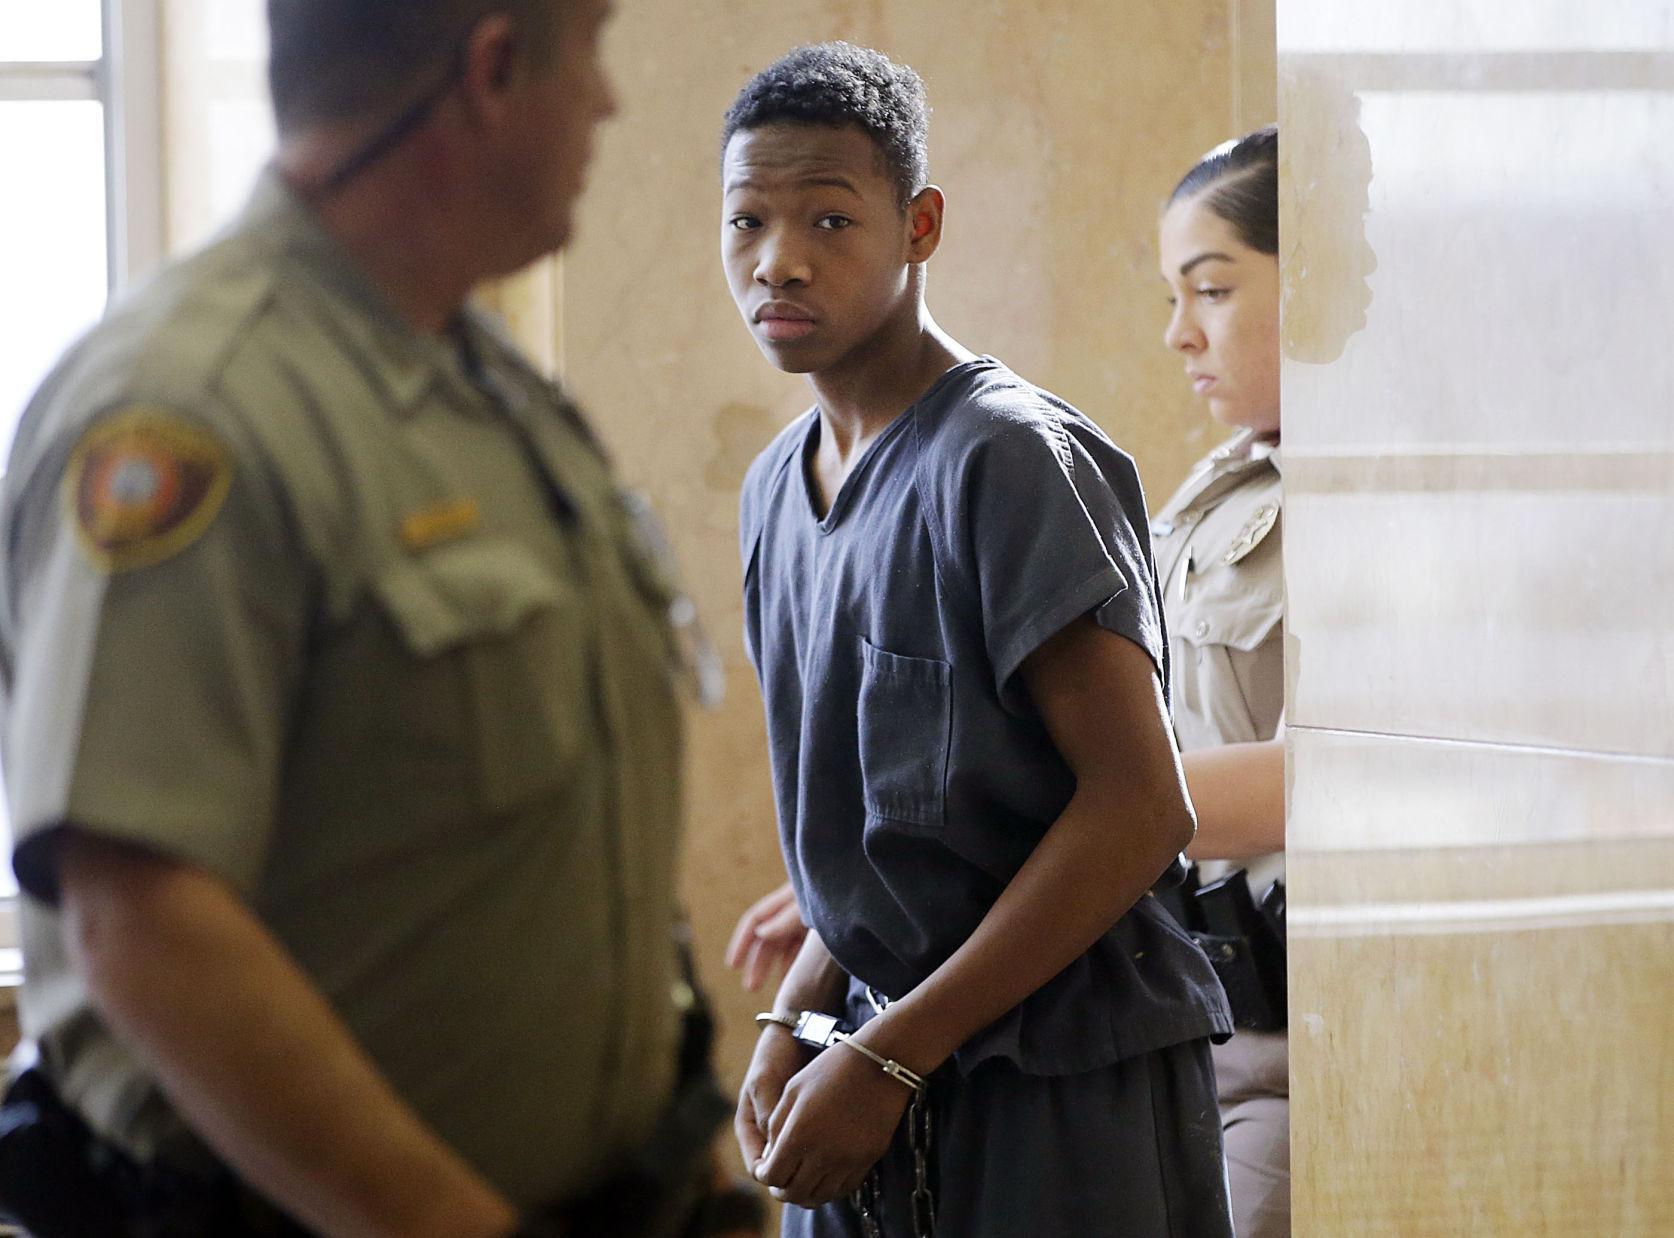 GREEN ROBBERY HEARING Teenage murder suspect has